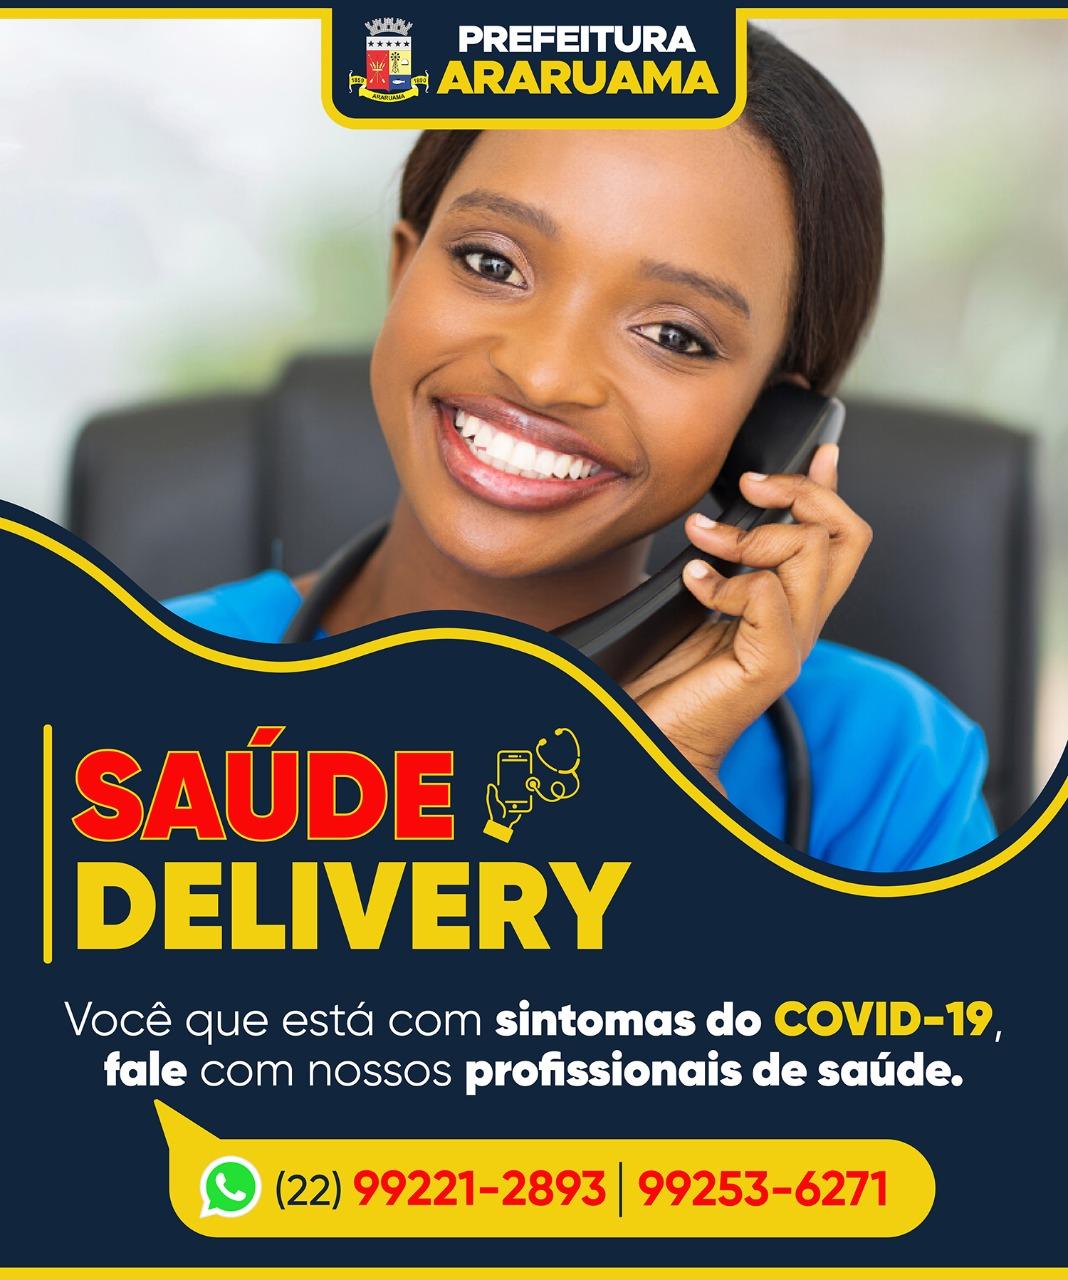 Prefeitura de Araruama lança projeto Saúde Delivery para ajudar identificar casos suspeitos de Covid-19